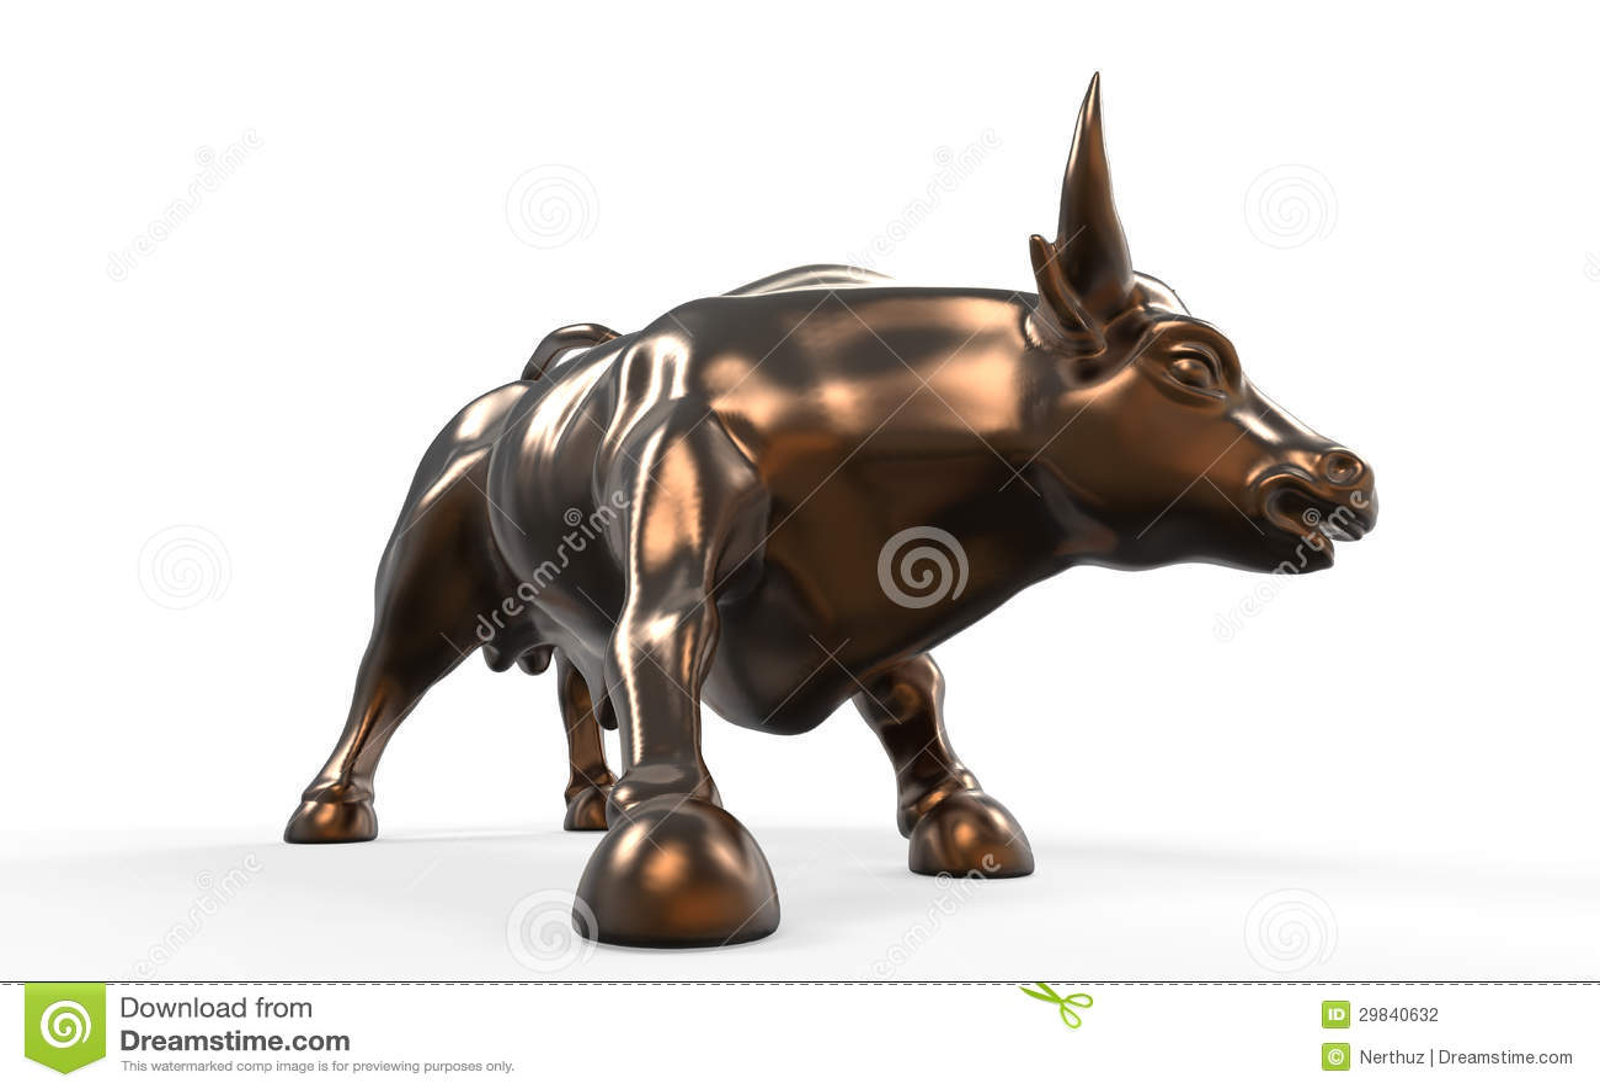 wall street chargeant la statue de taureau illustration. Black Bedroom Furniture Sets. Home Design Ideas